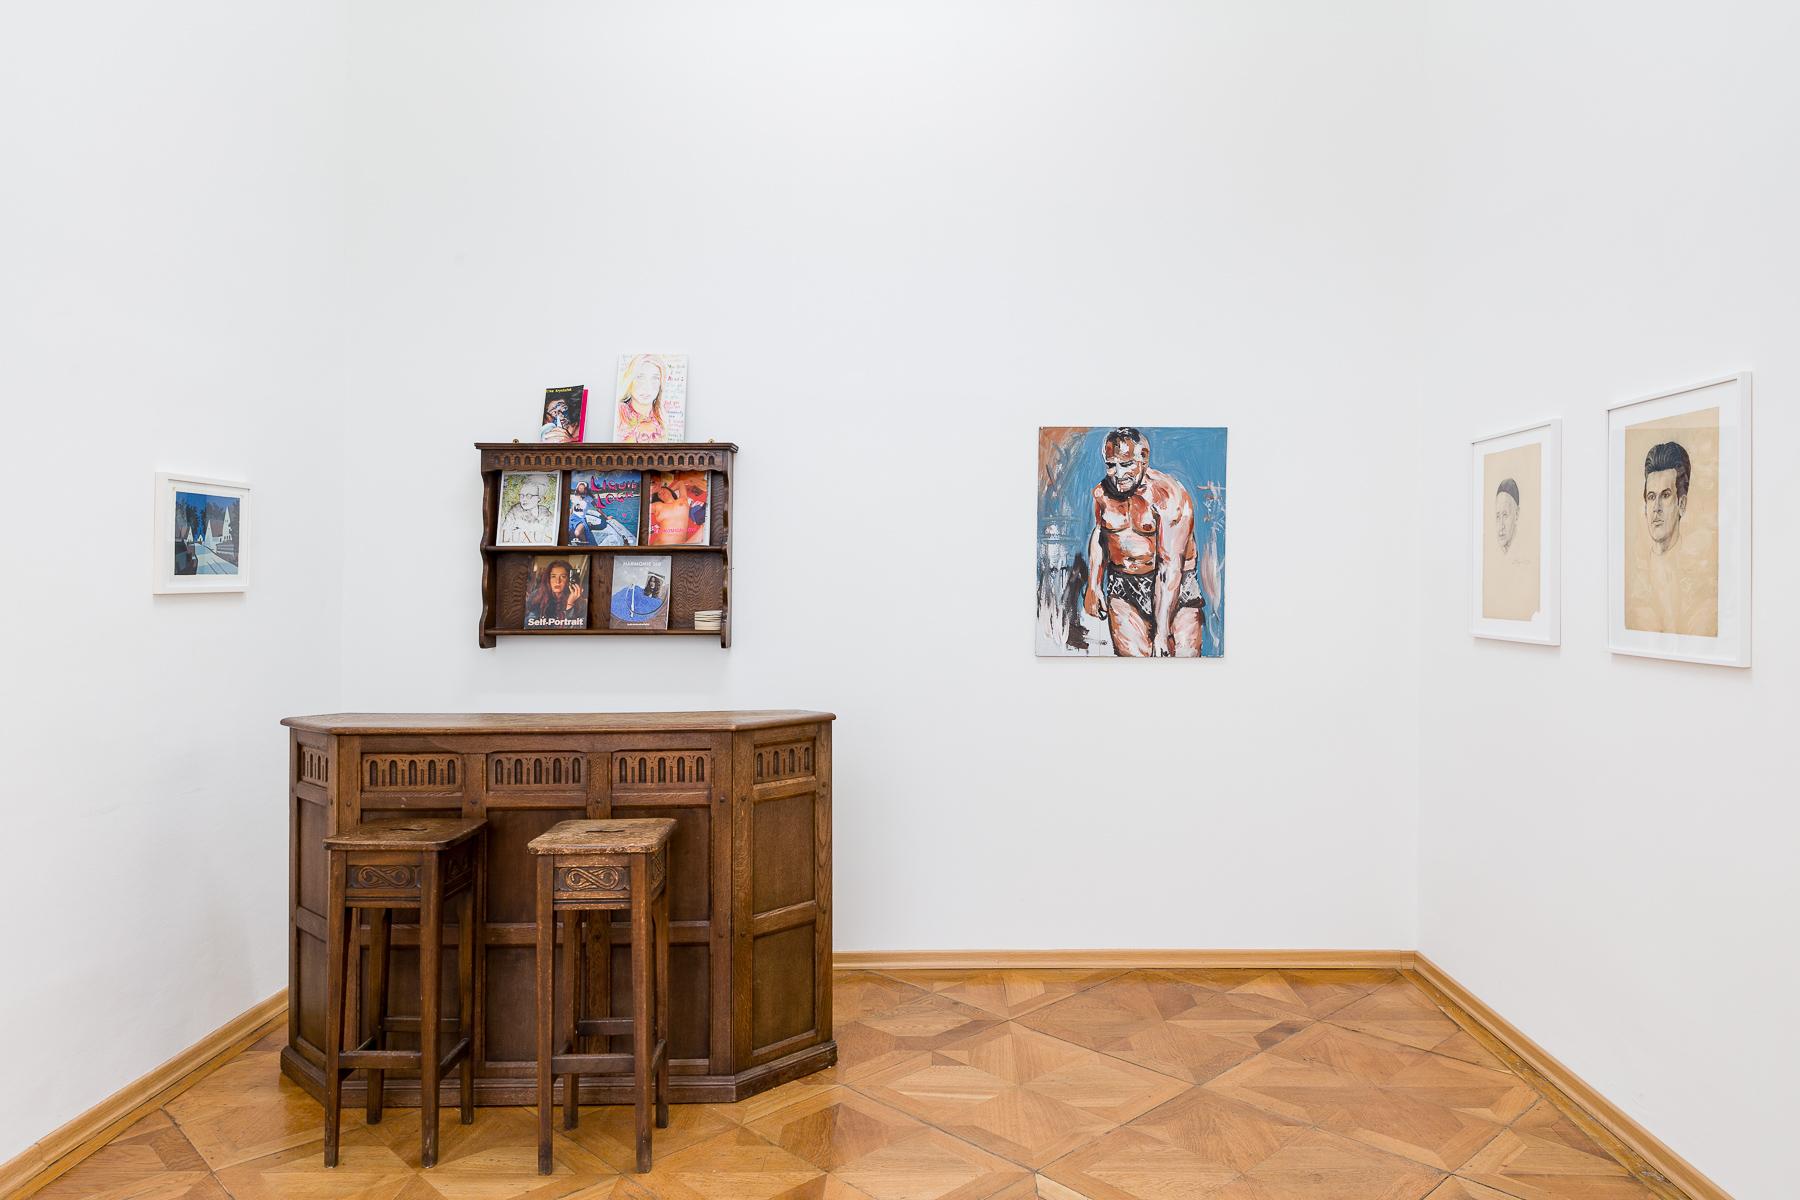 2019_05_20_Elke-Krystufek_Croy-Nielsen_by-kunst-dokumentation-com_038_web.jpg